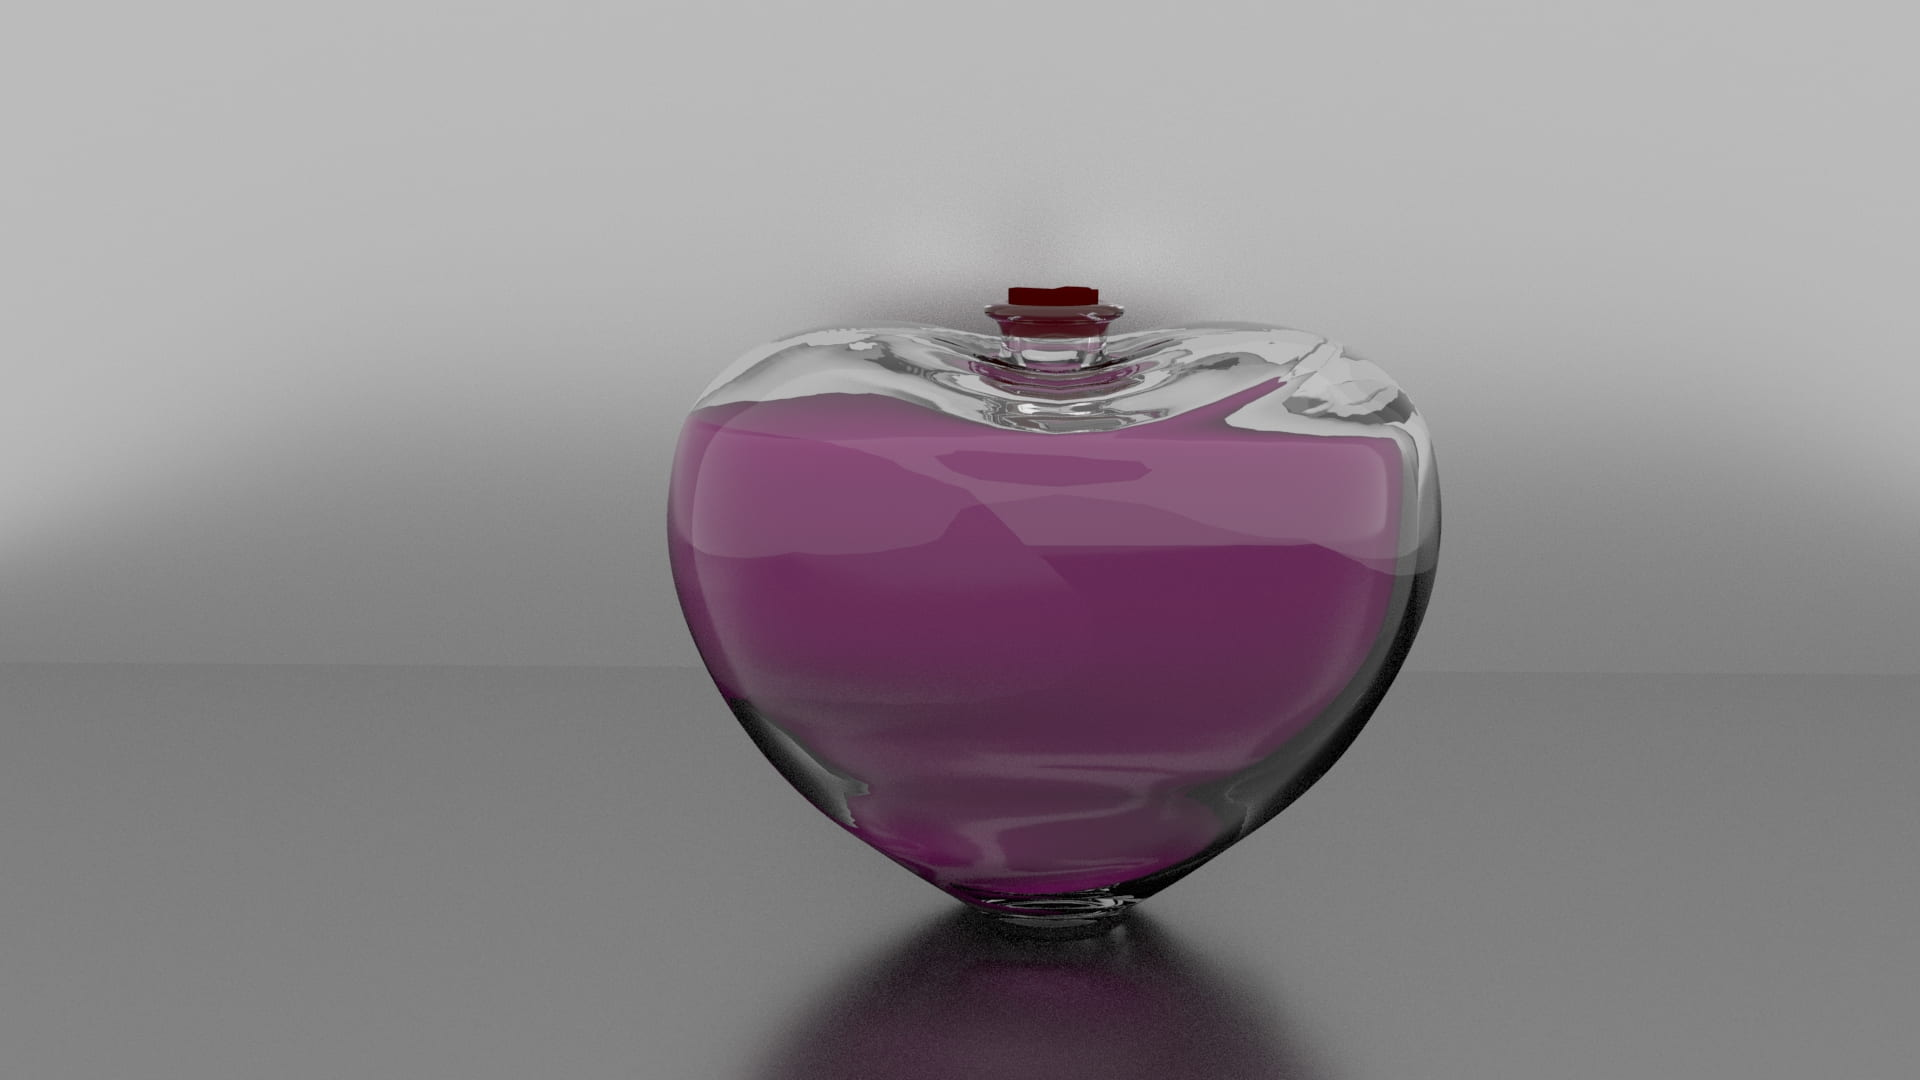 Heart shaped bottle of a pink liquid.